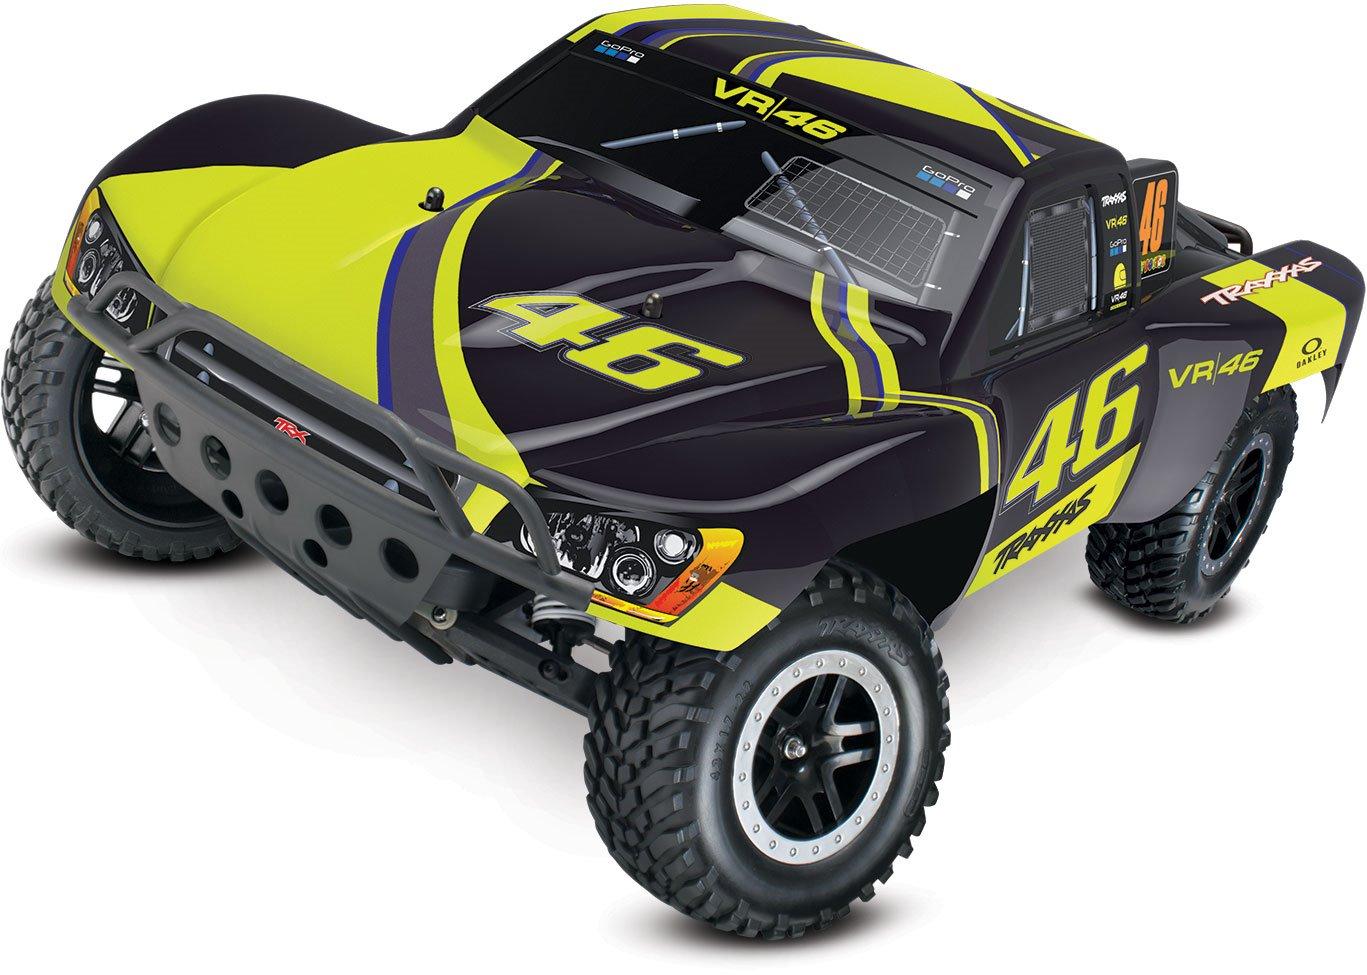 Traxxas Slash 1/10 2WD RTR - VR46